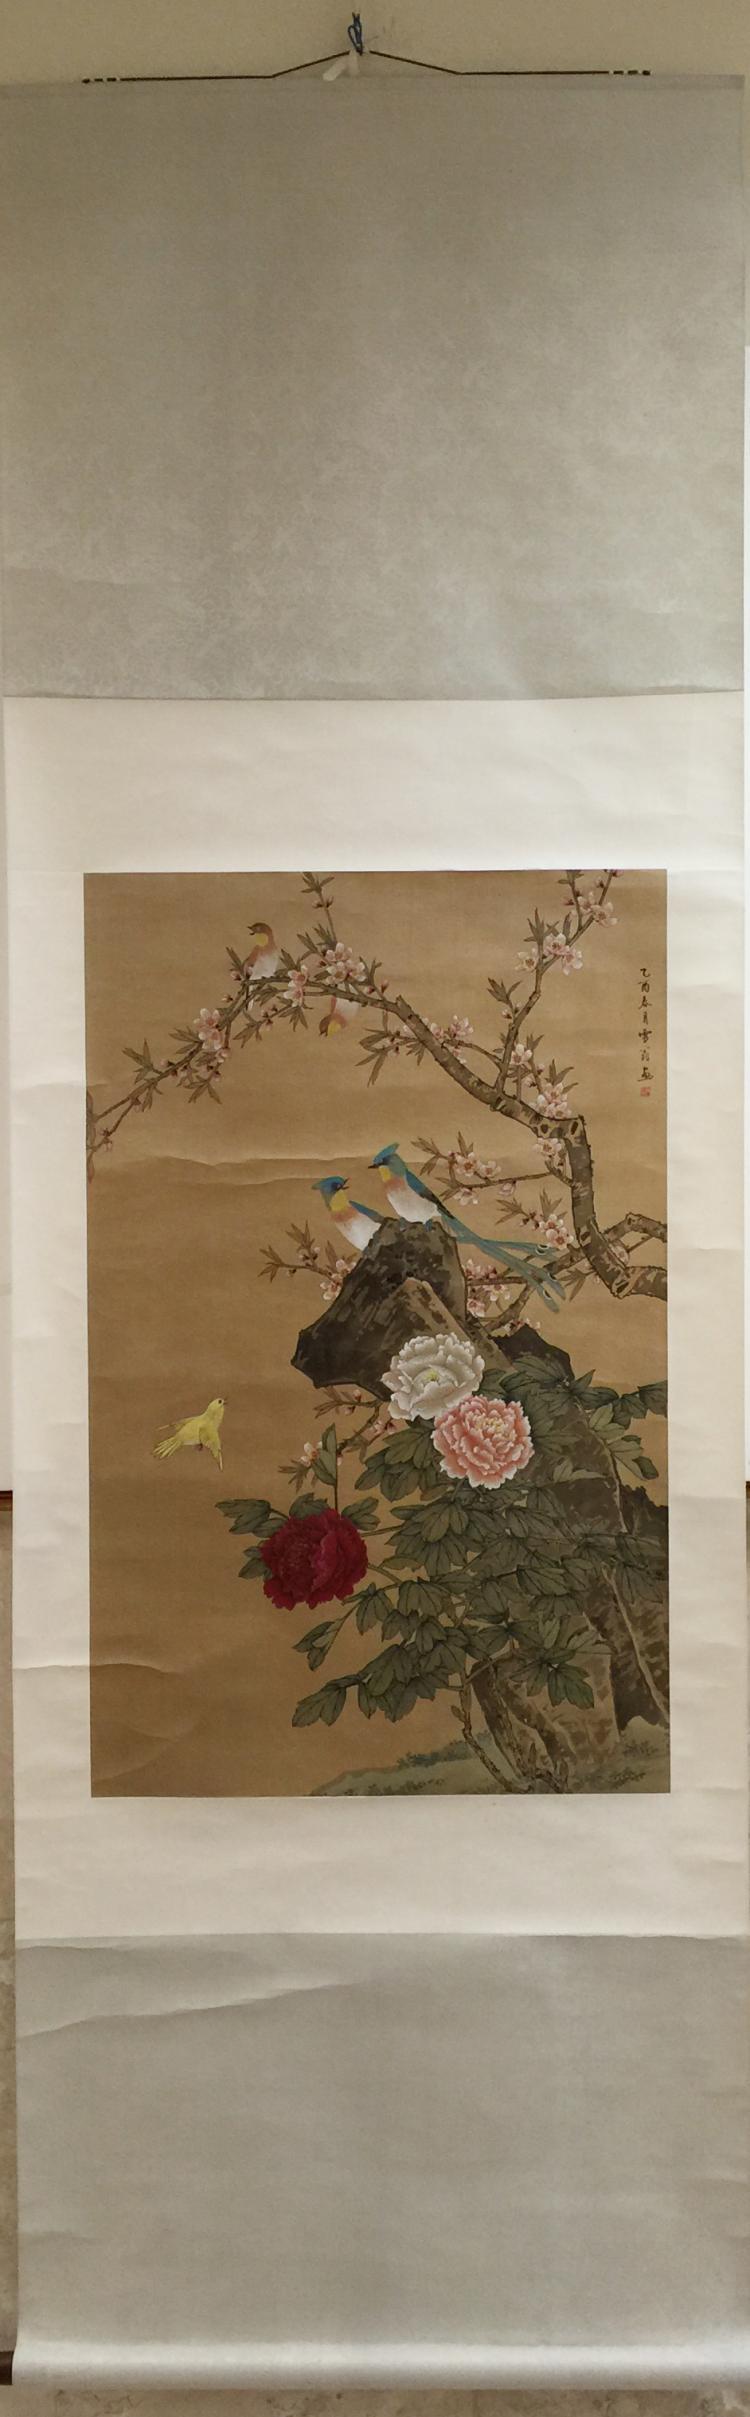 Chen Zhifo£¨1896£1962), Flower and Bird